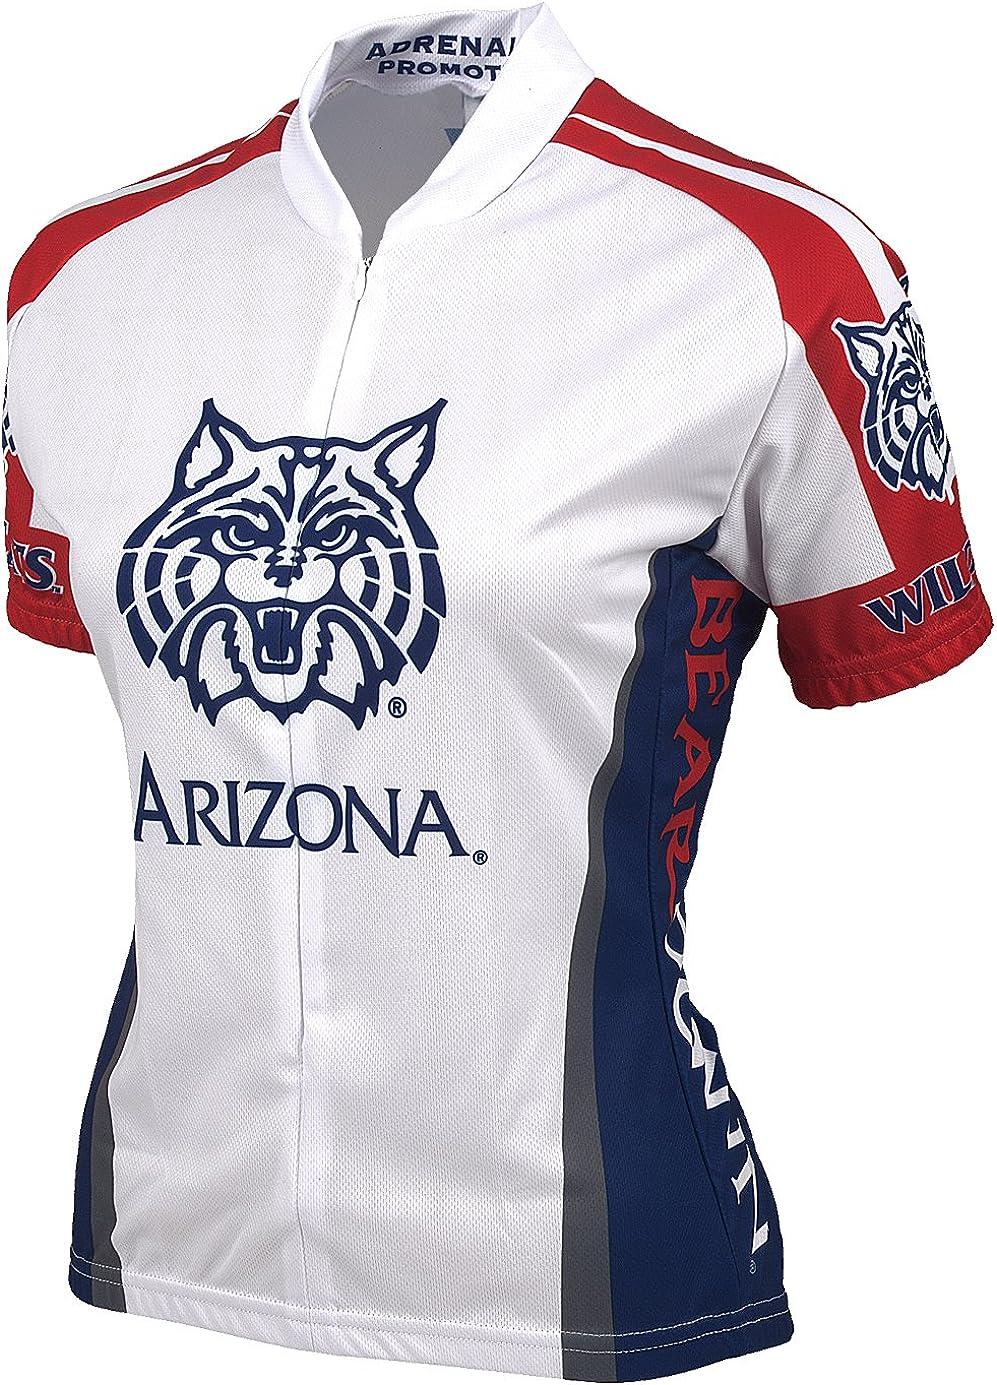 Arizona Women's Cycling Jersey